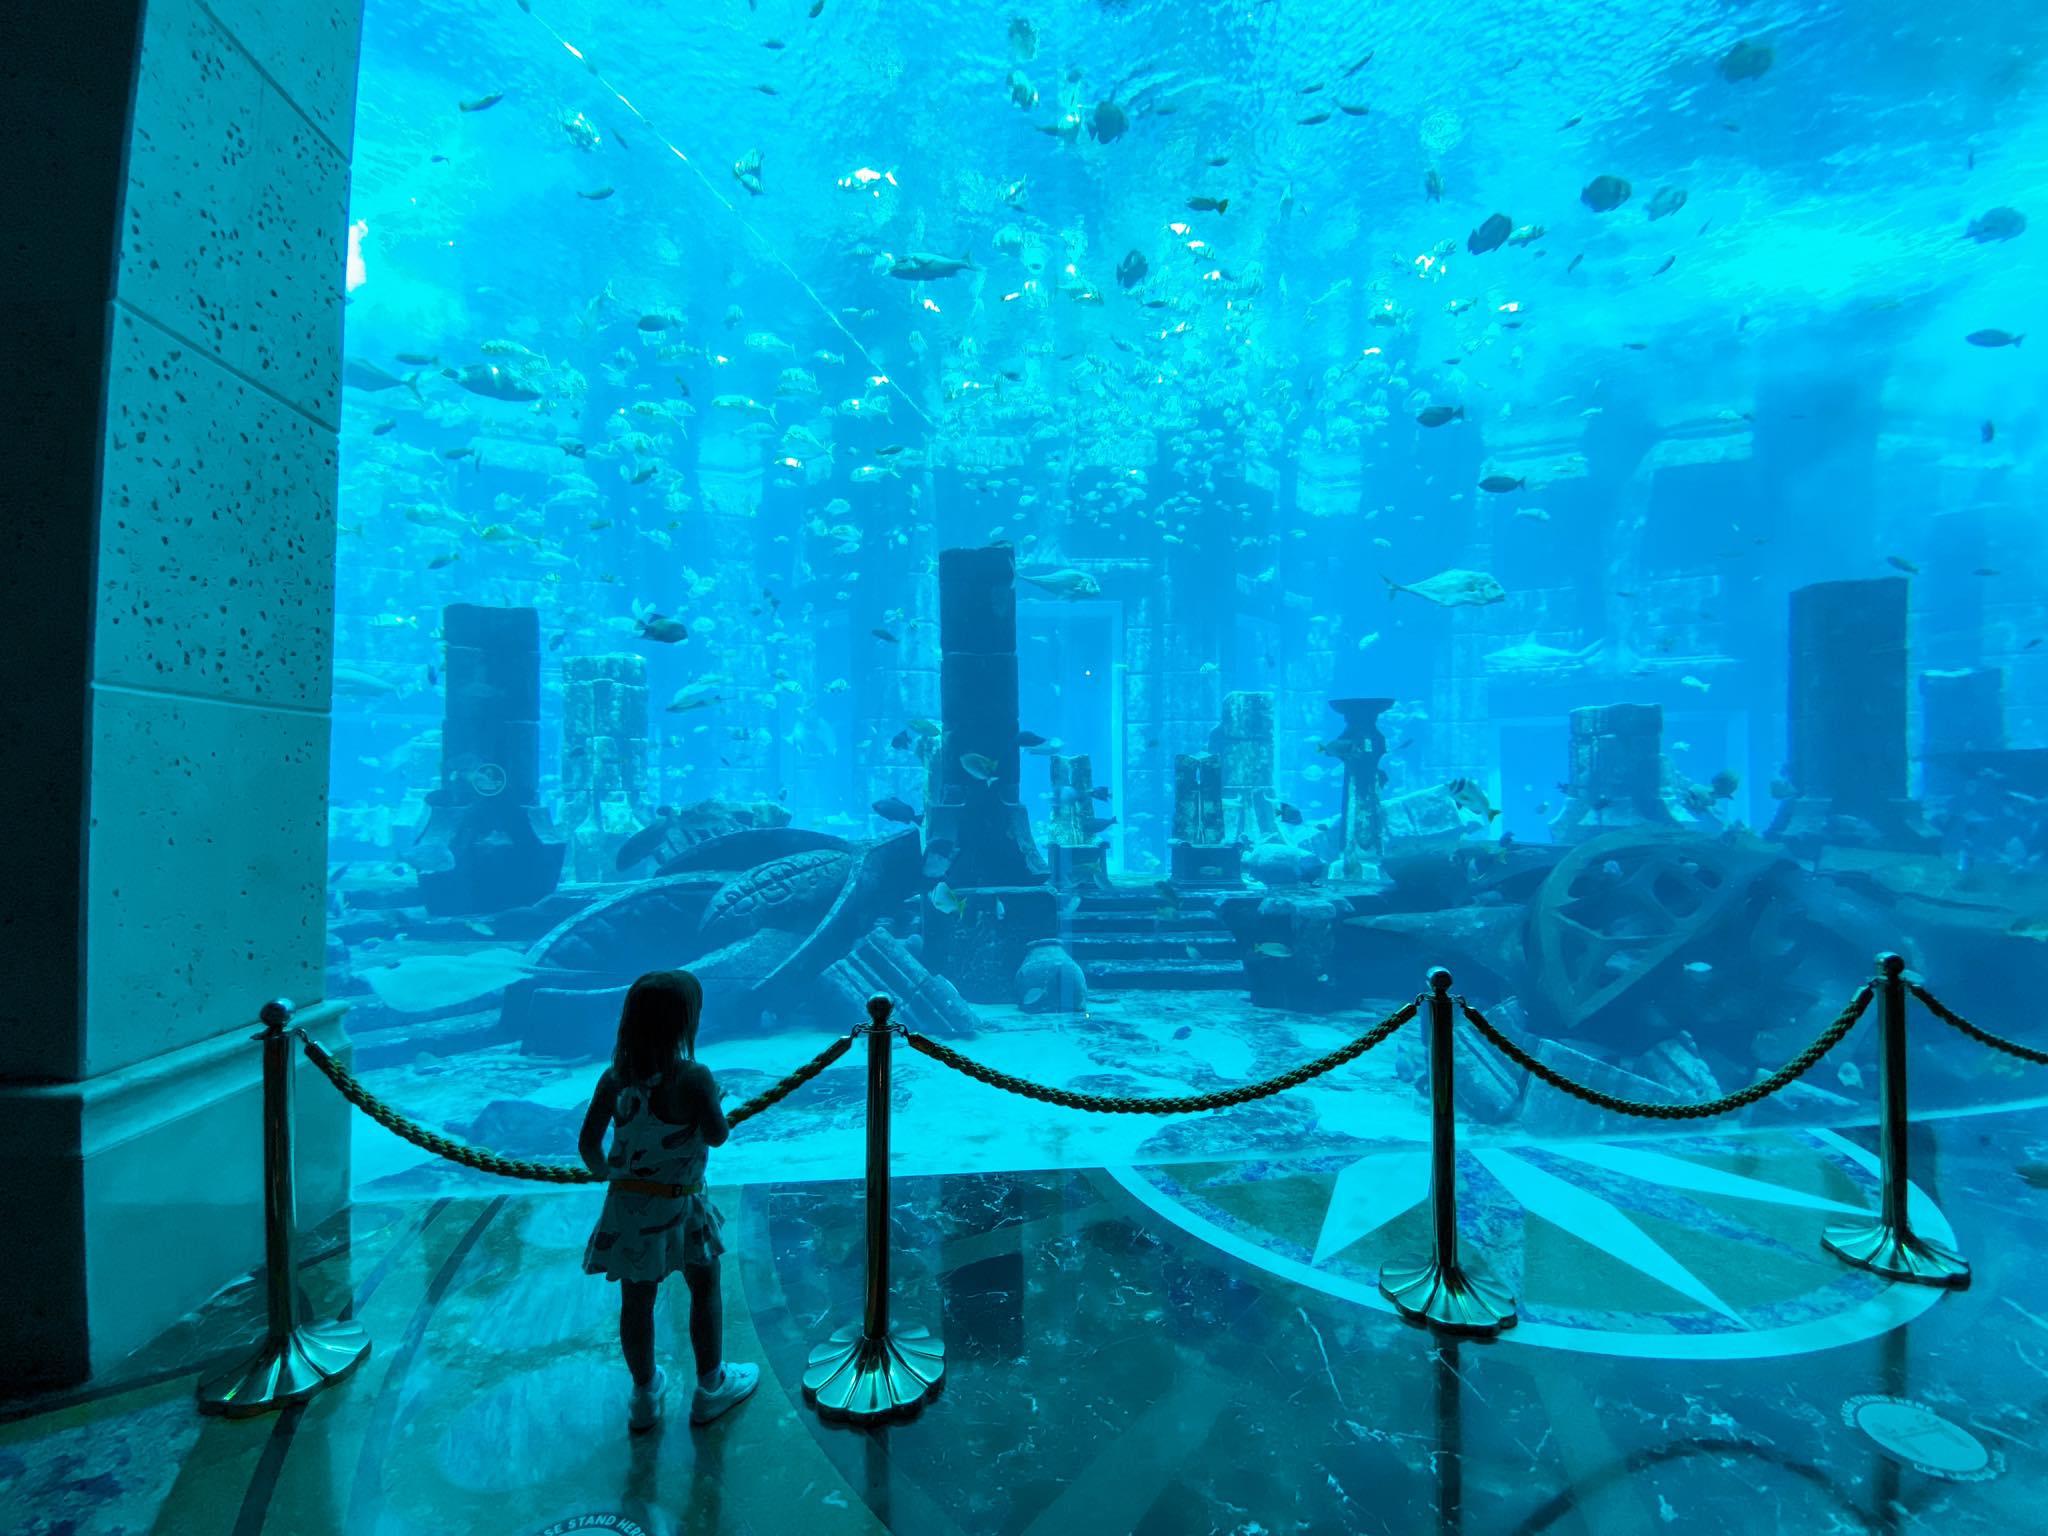 Atlantis_Lost Chambers